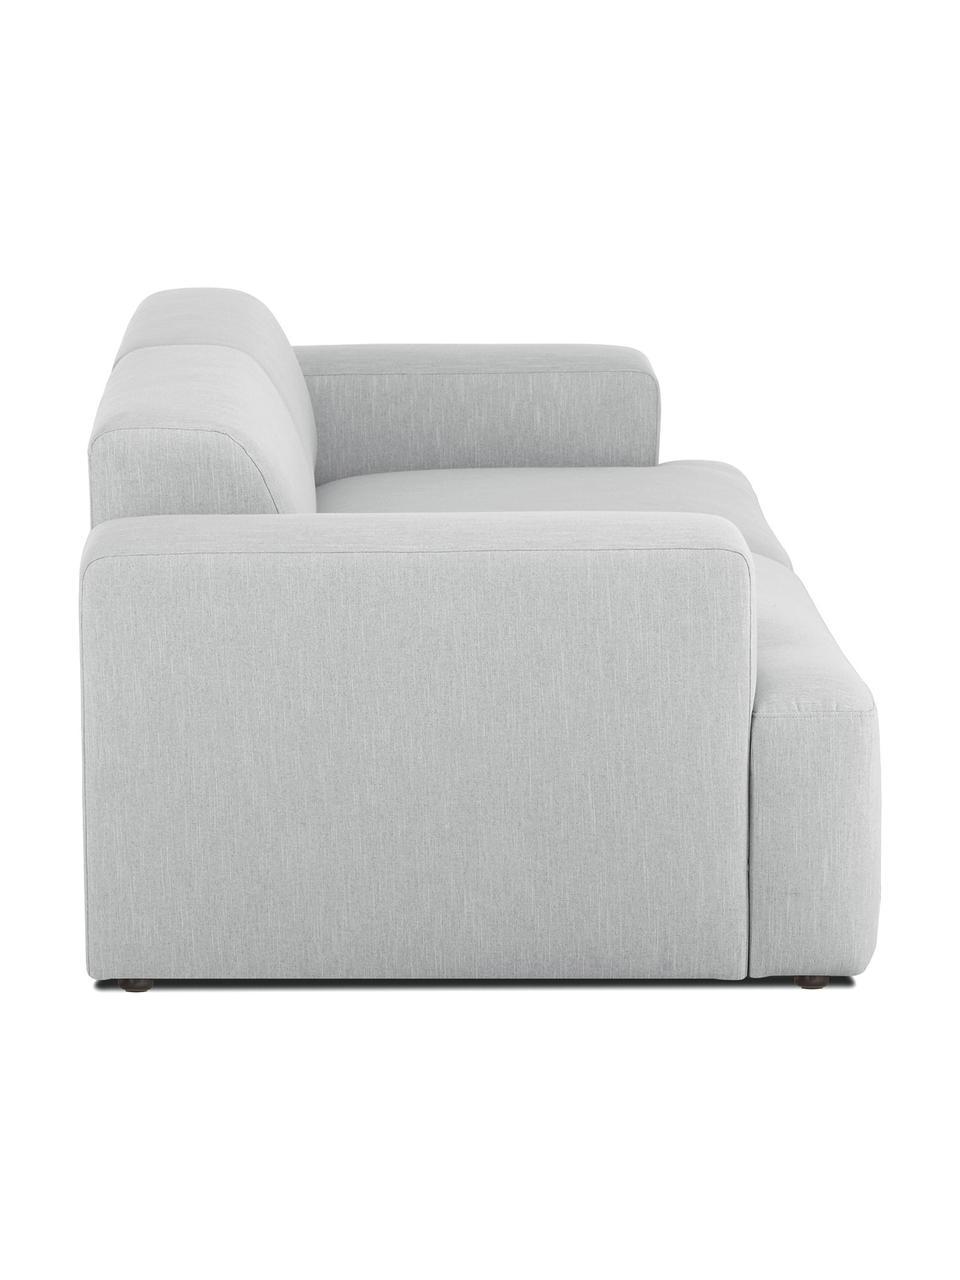 Canapé 3places gris clair Melva, Tissu gris clair